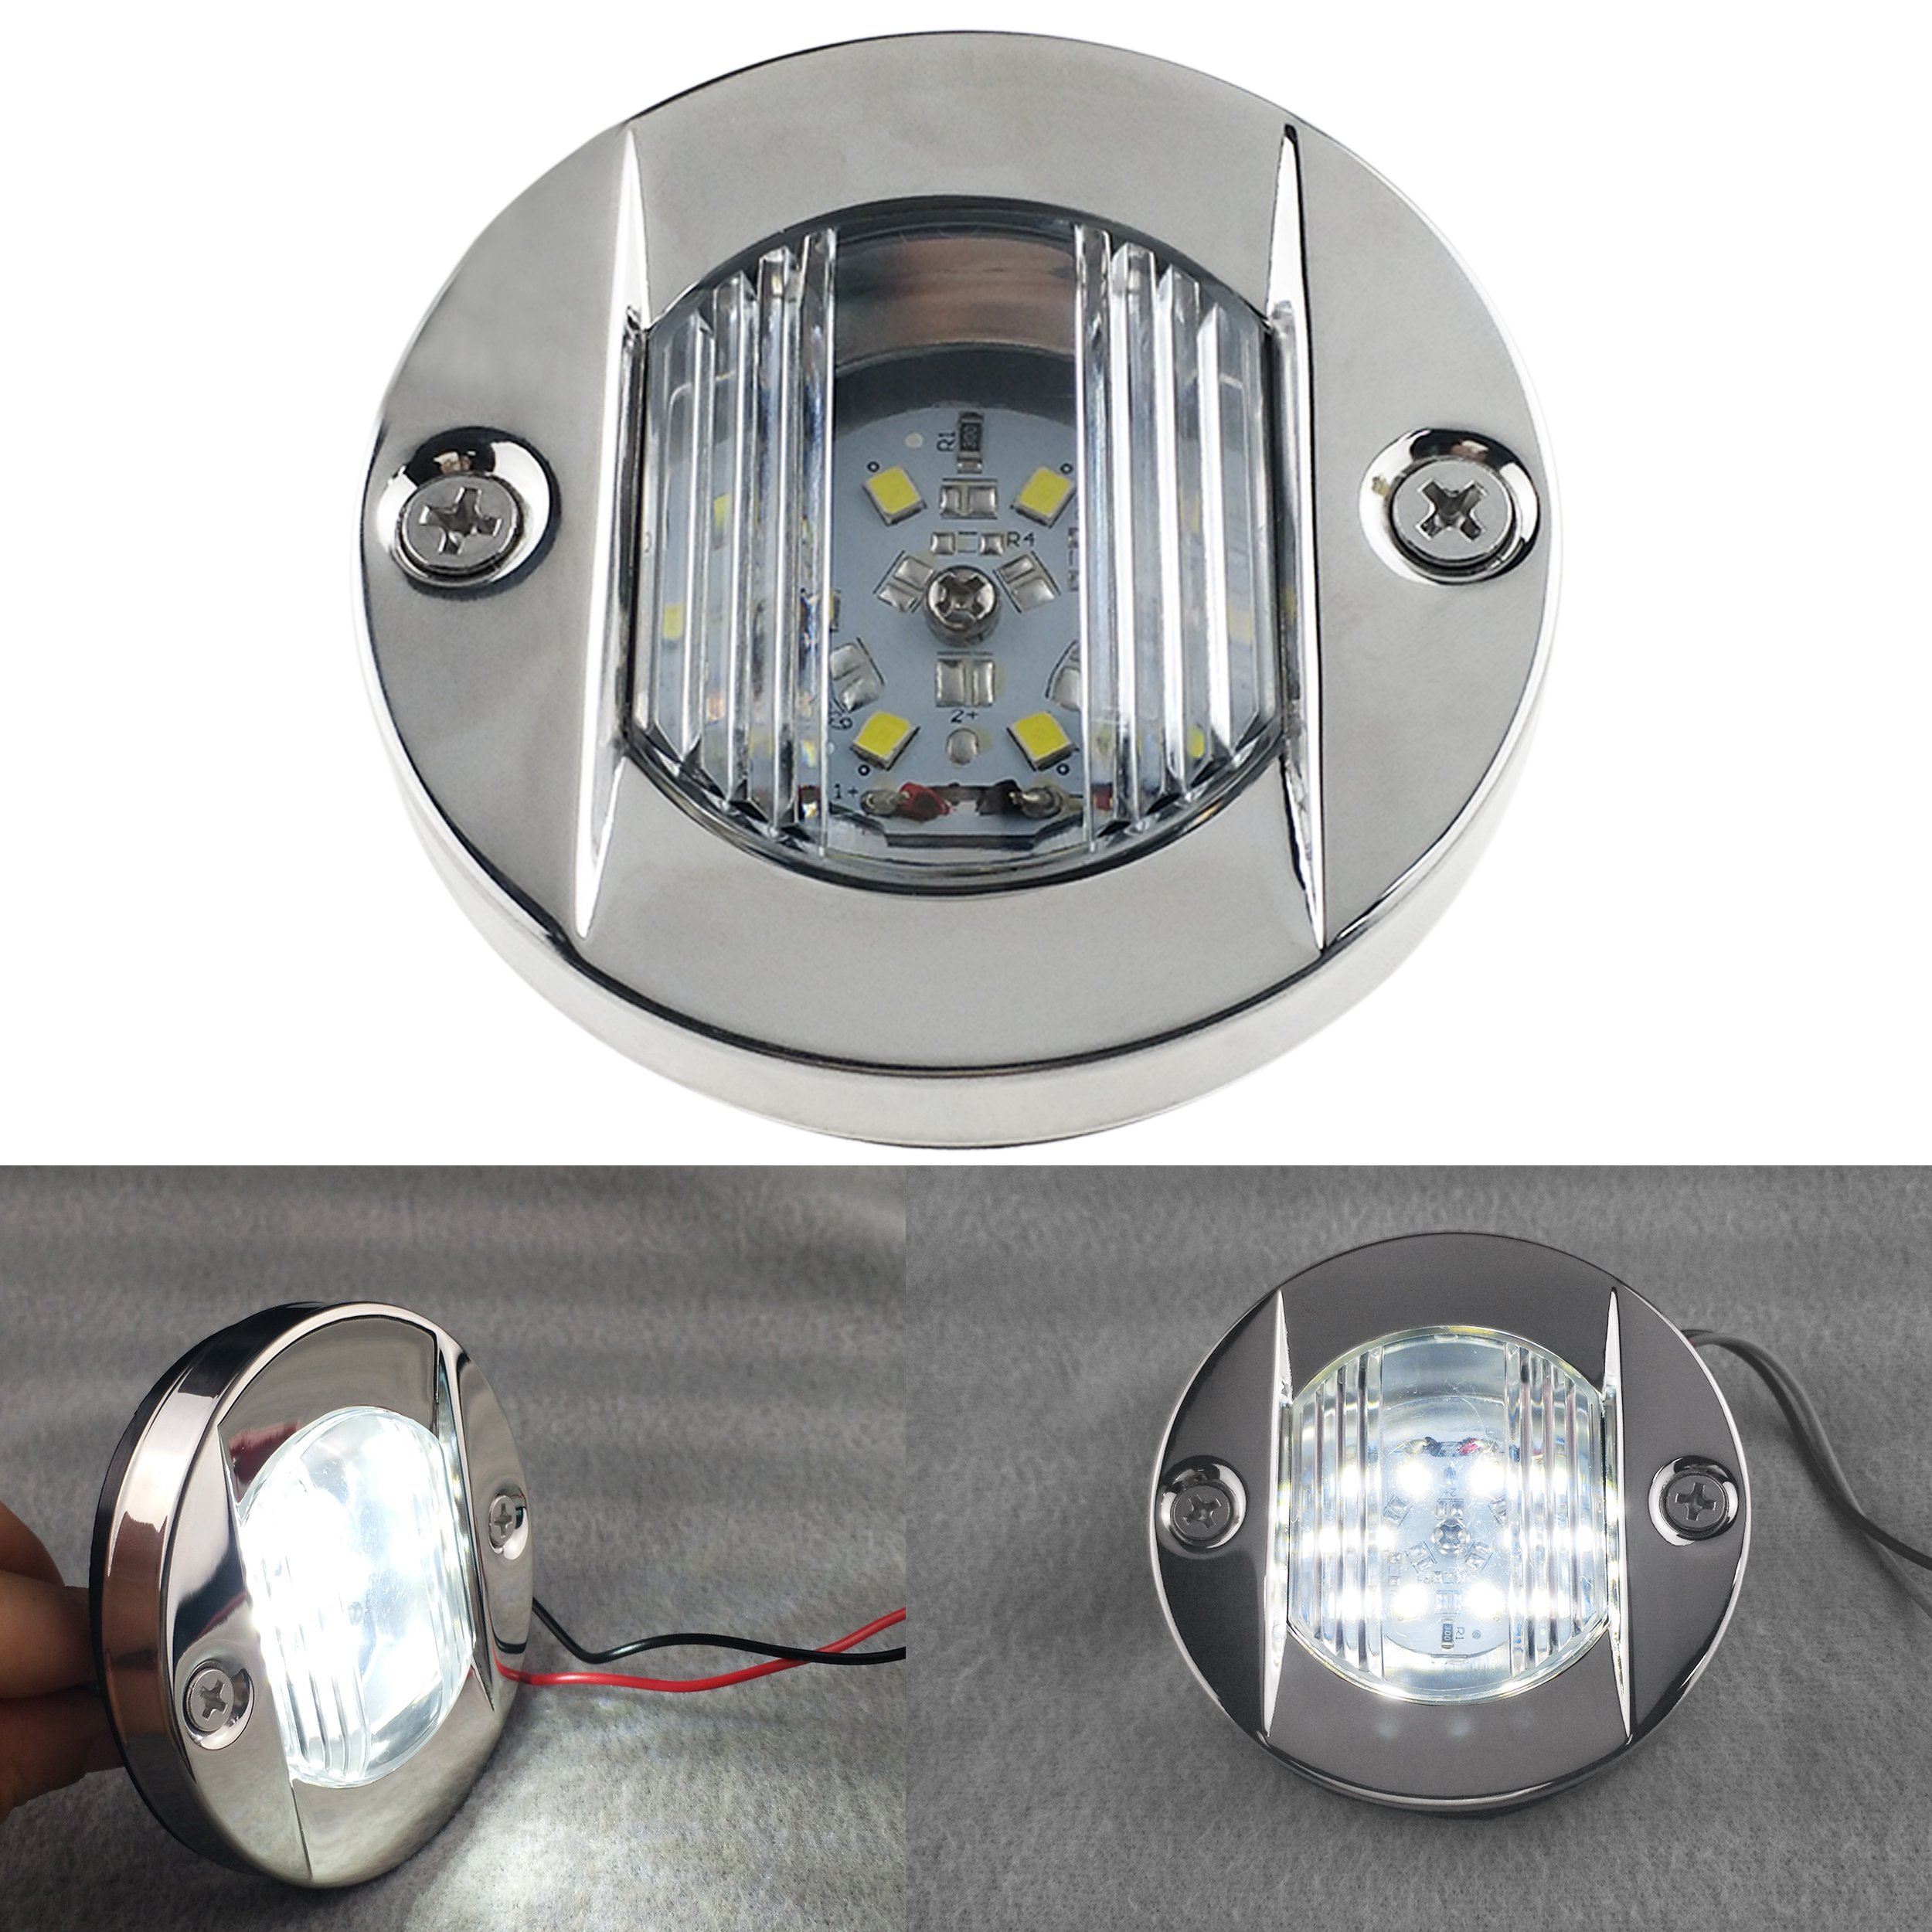 iztor 12V Marine Boat Yacht Transom Anchor Stern LED Navigation Light Lamp White 304 Stainless Steel Round